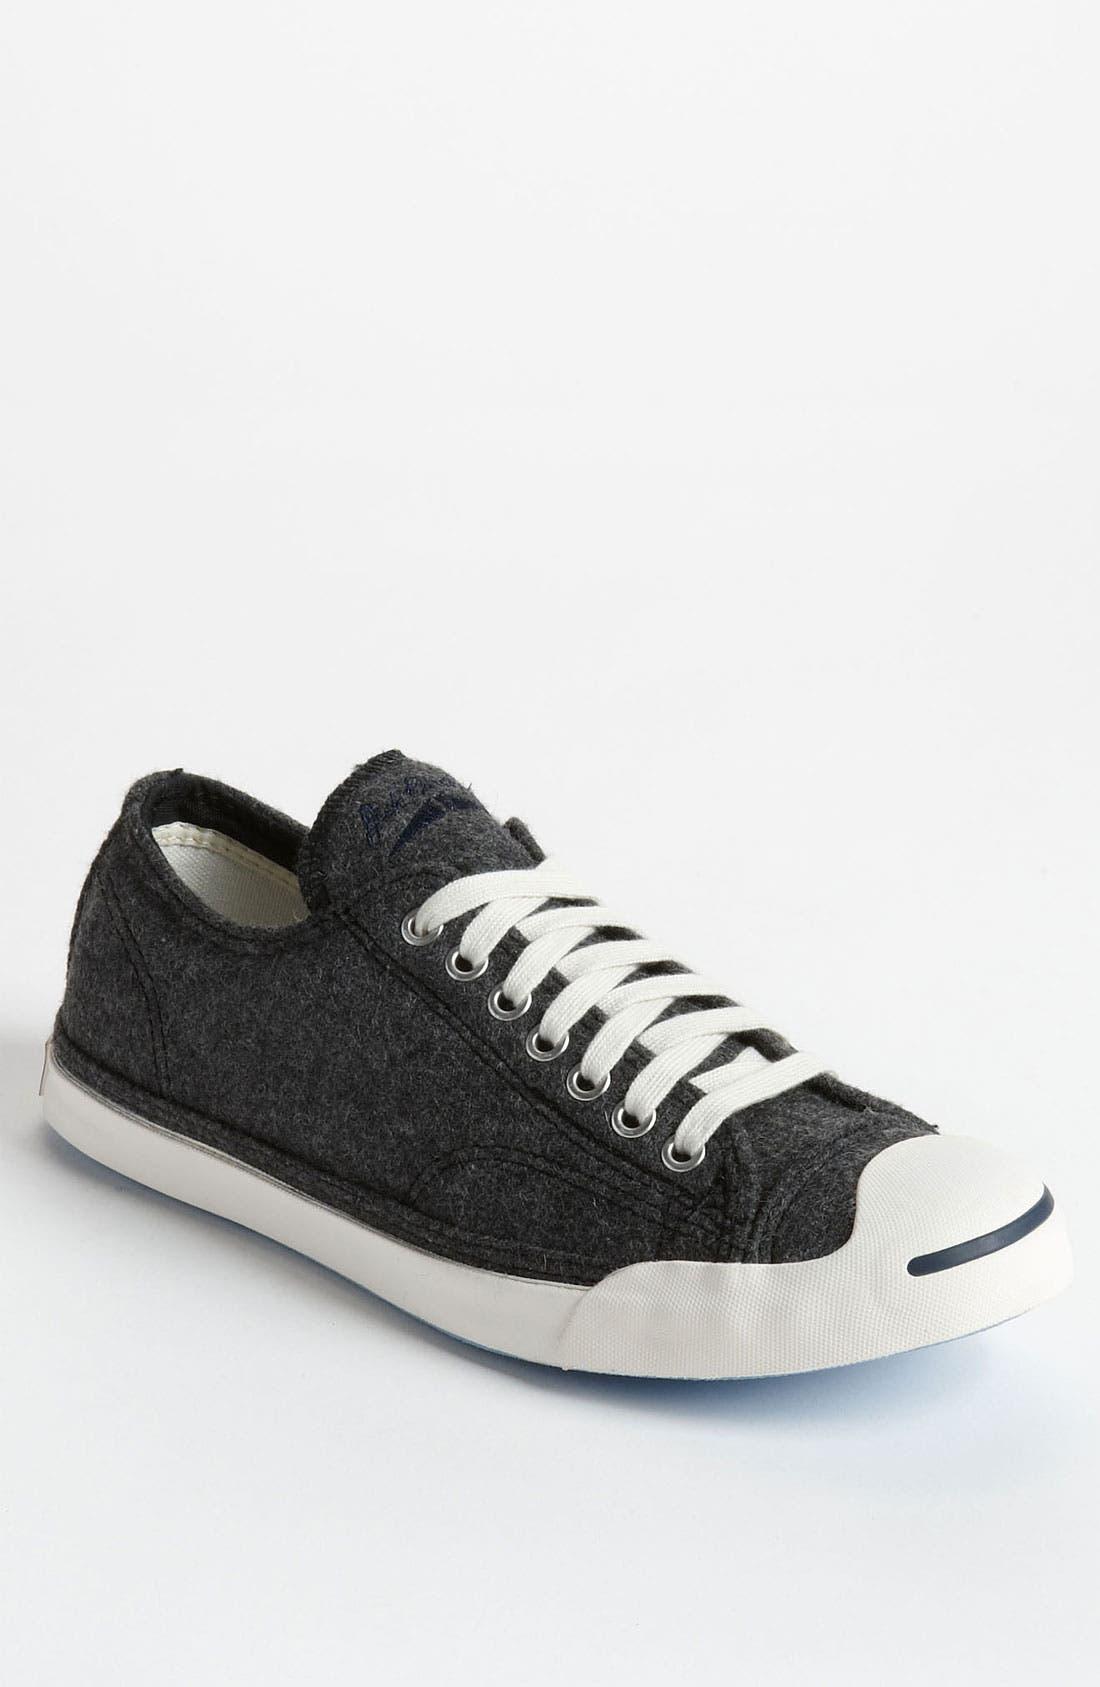 Main Image - Converse 'Jack Purcell LP' Slip-On Sneaker (Men)